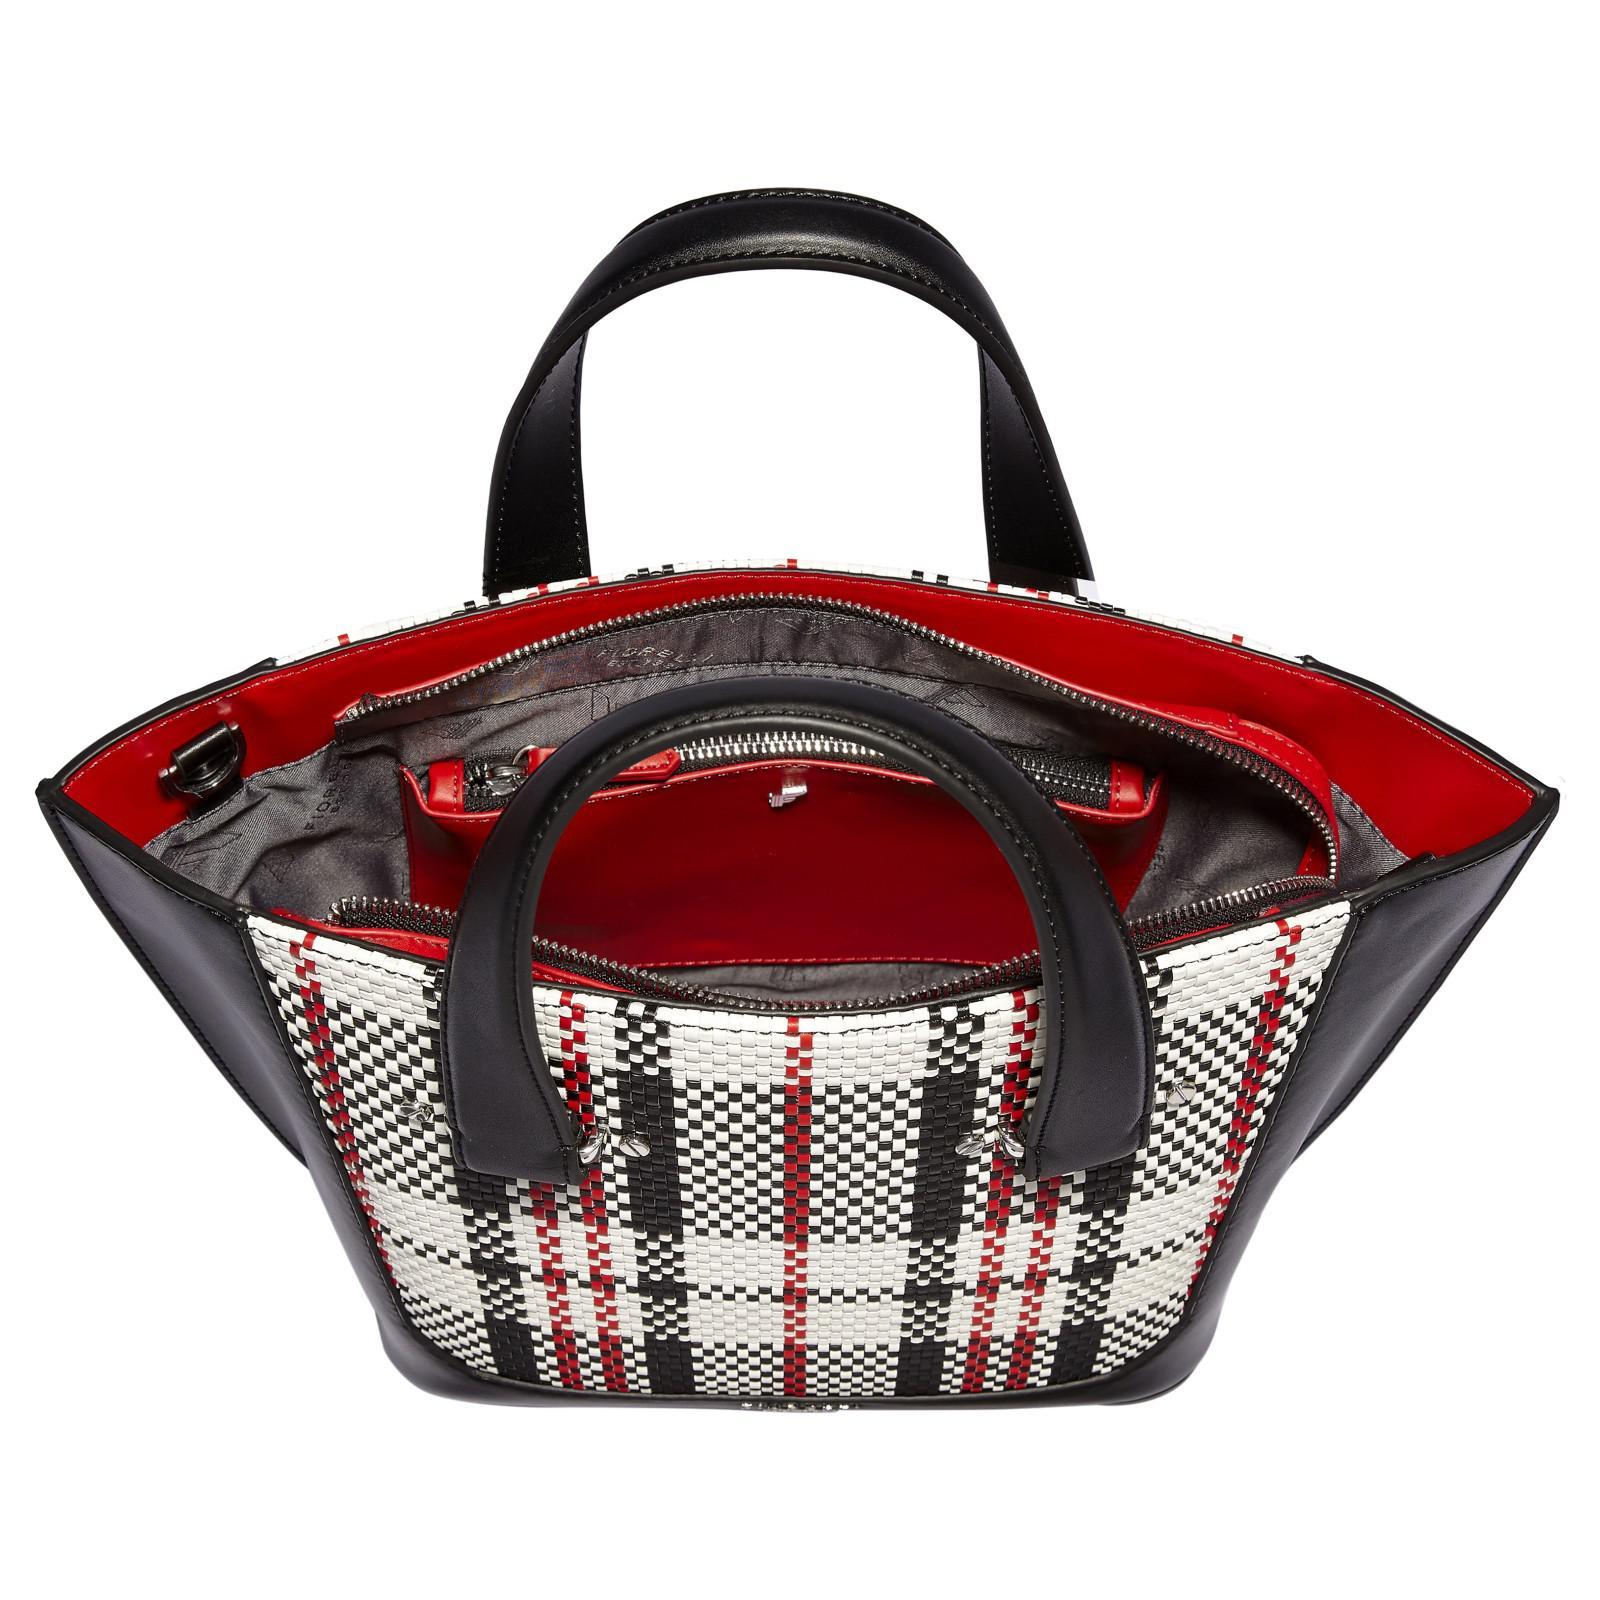 Fiorelli Synthetic Tisbury Mini Tote Bag in Red